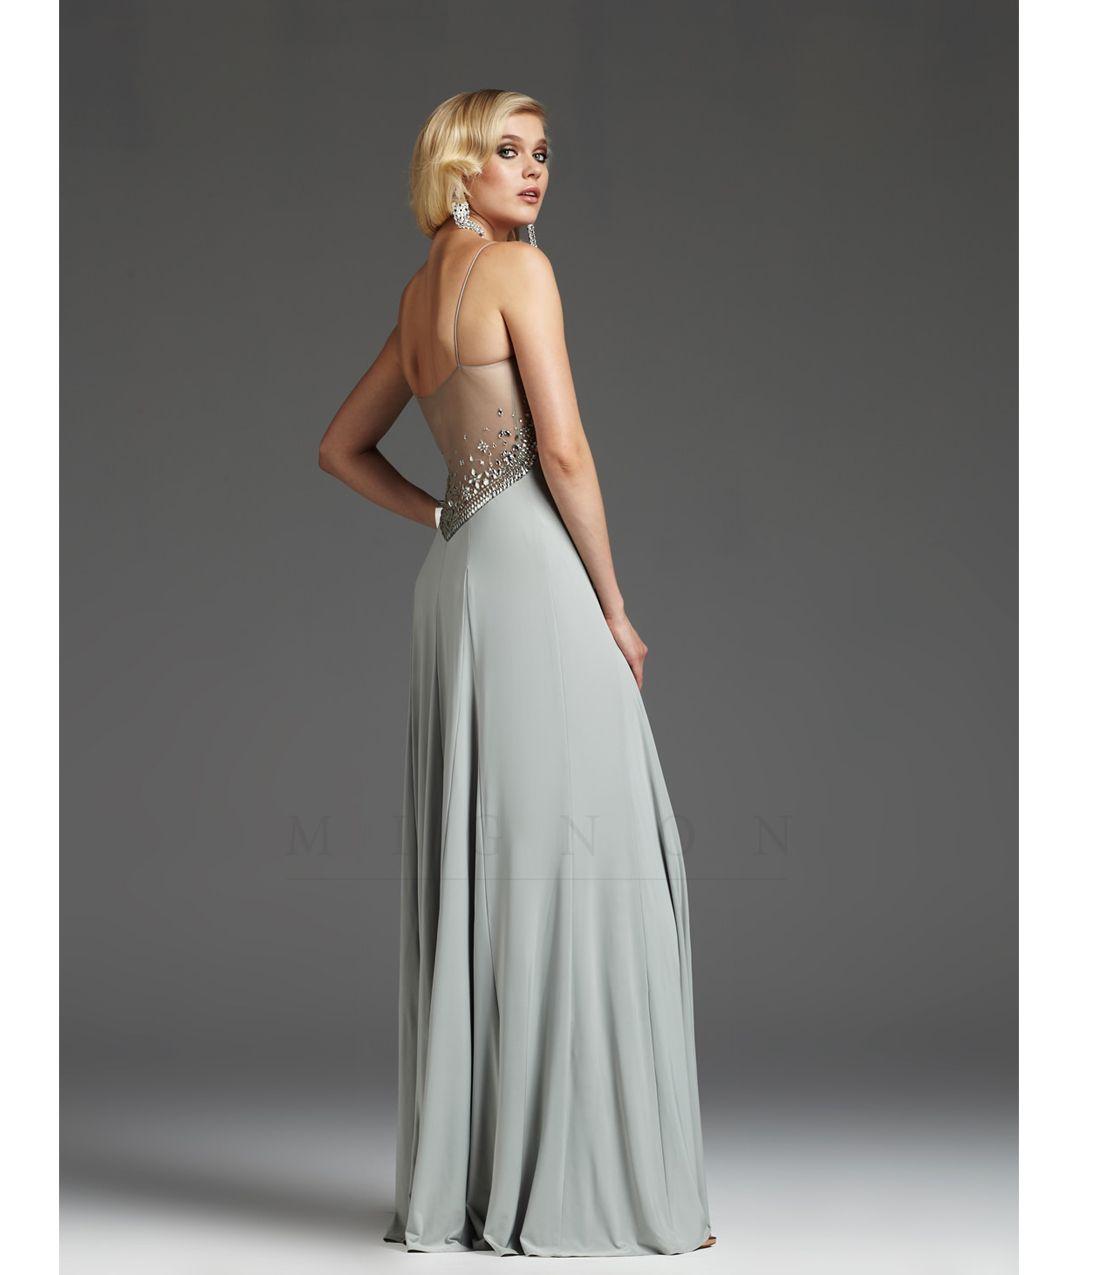 168 Stop Staring! 1930s Style Navy & Ivory Railene Dress